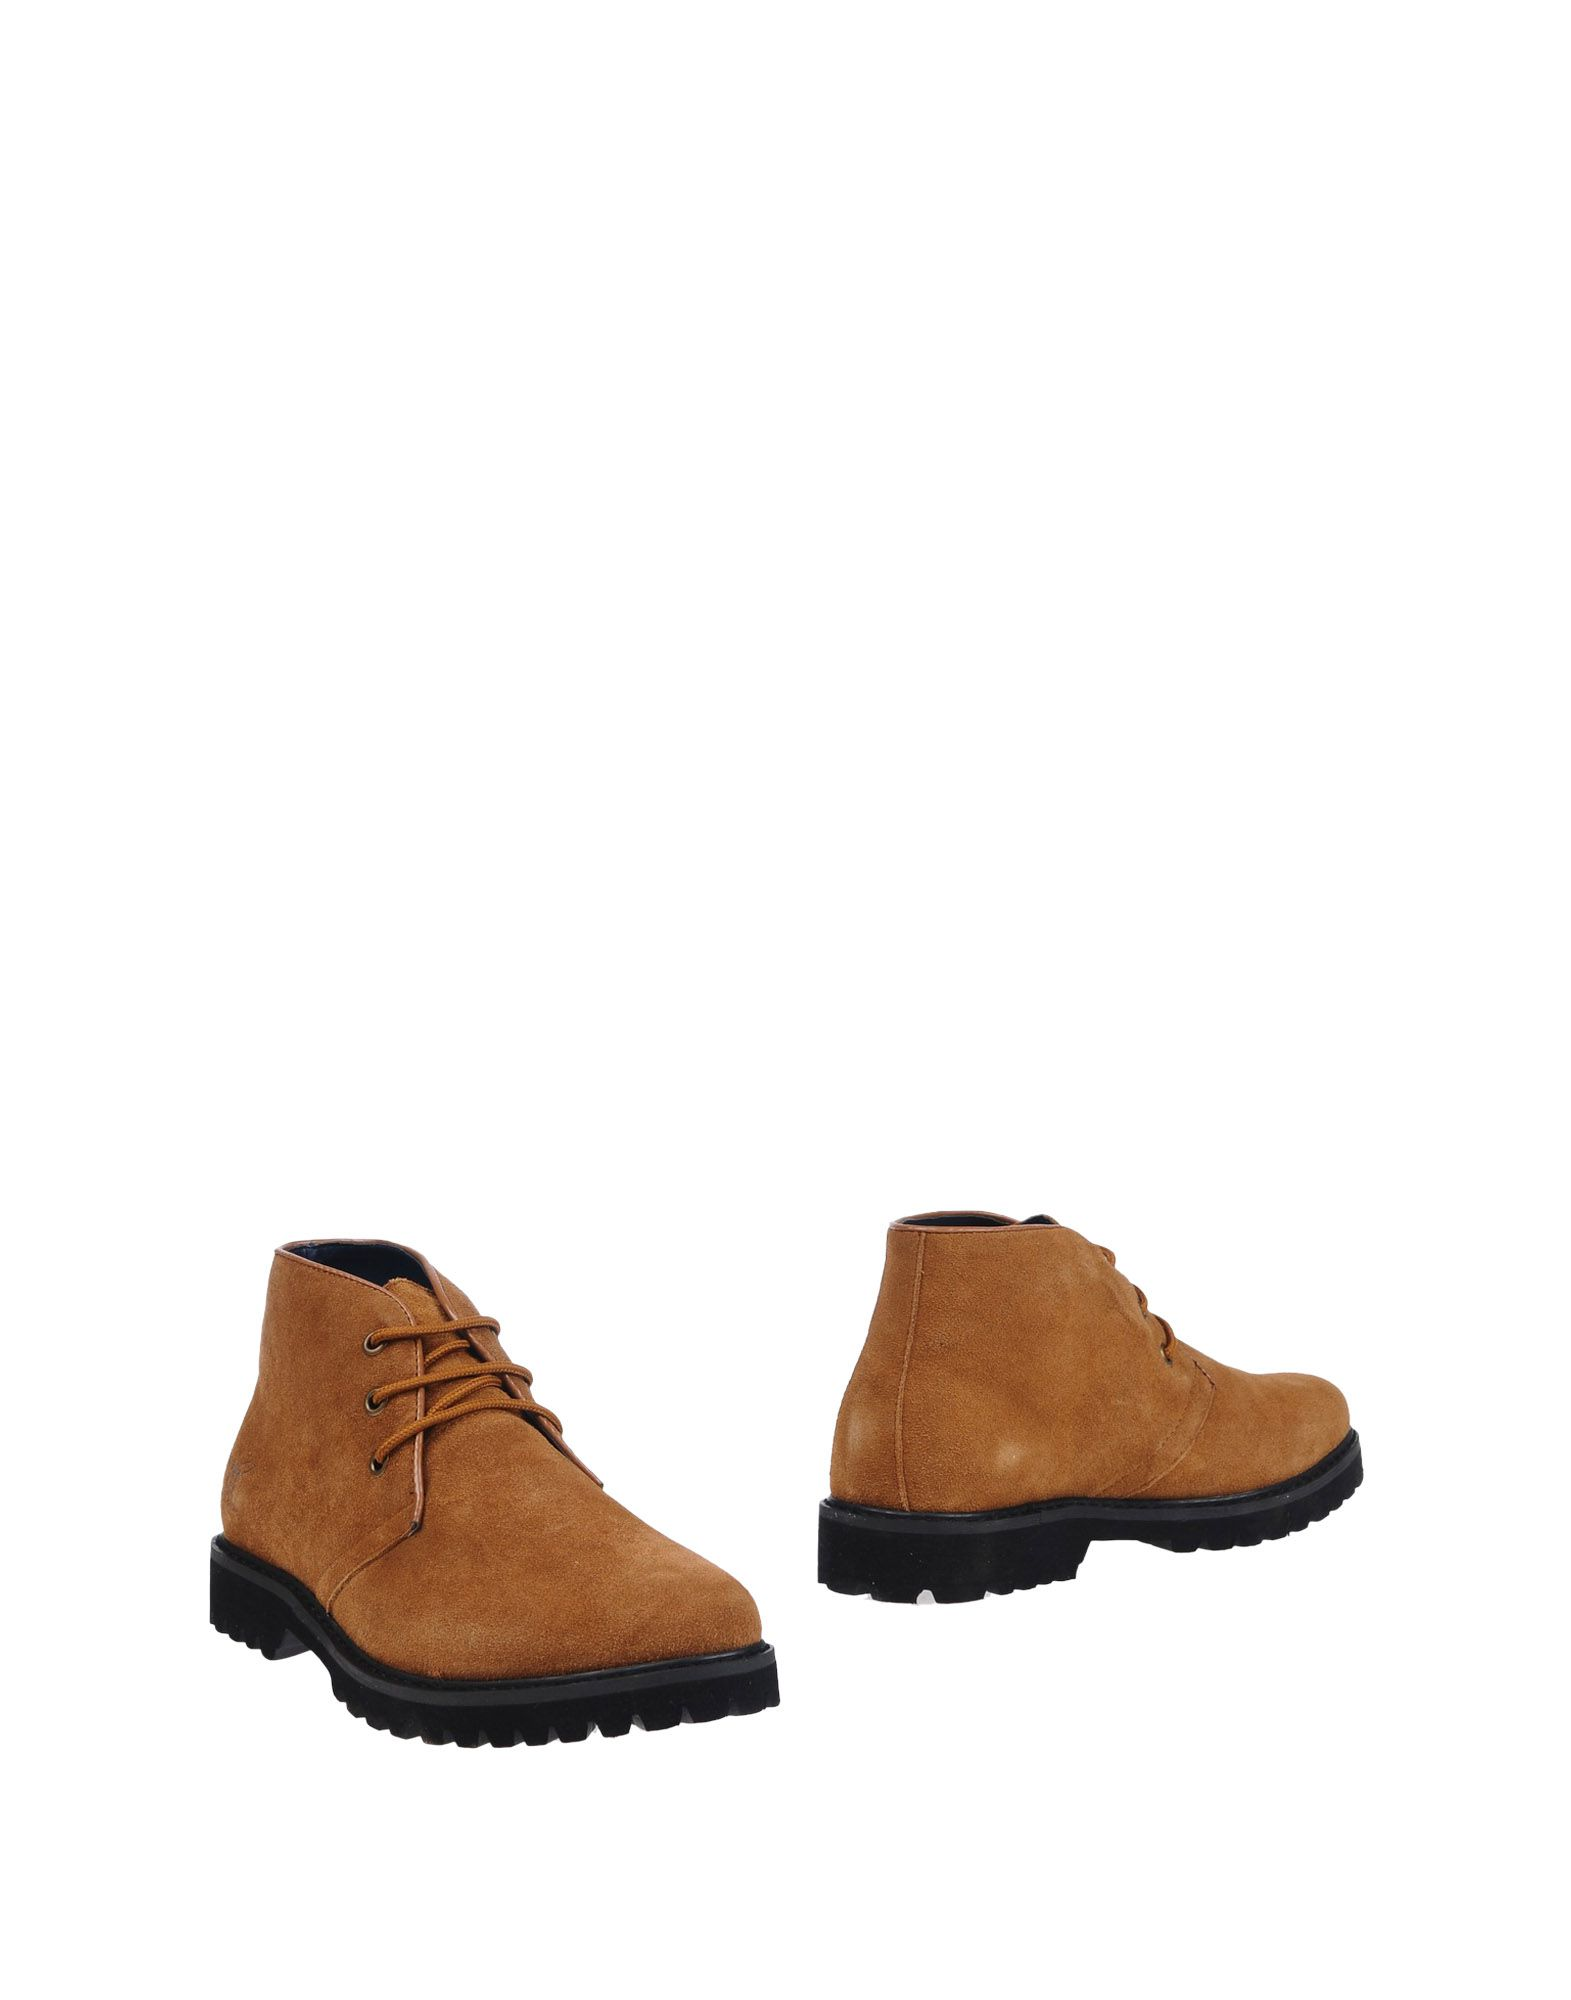 Rabatt echte Schuhe Henry Cotton's Stiefelette Herren  11233453PW